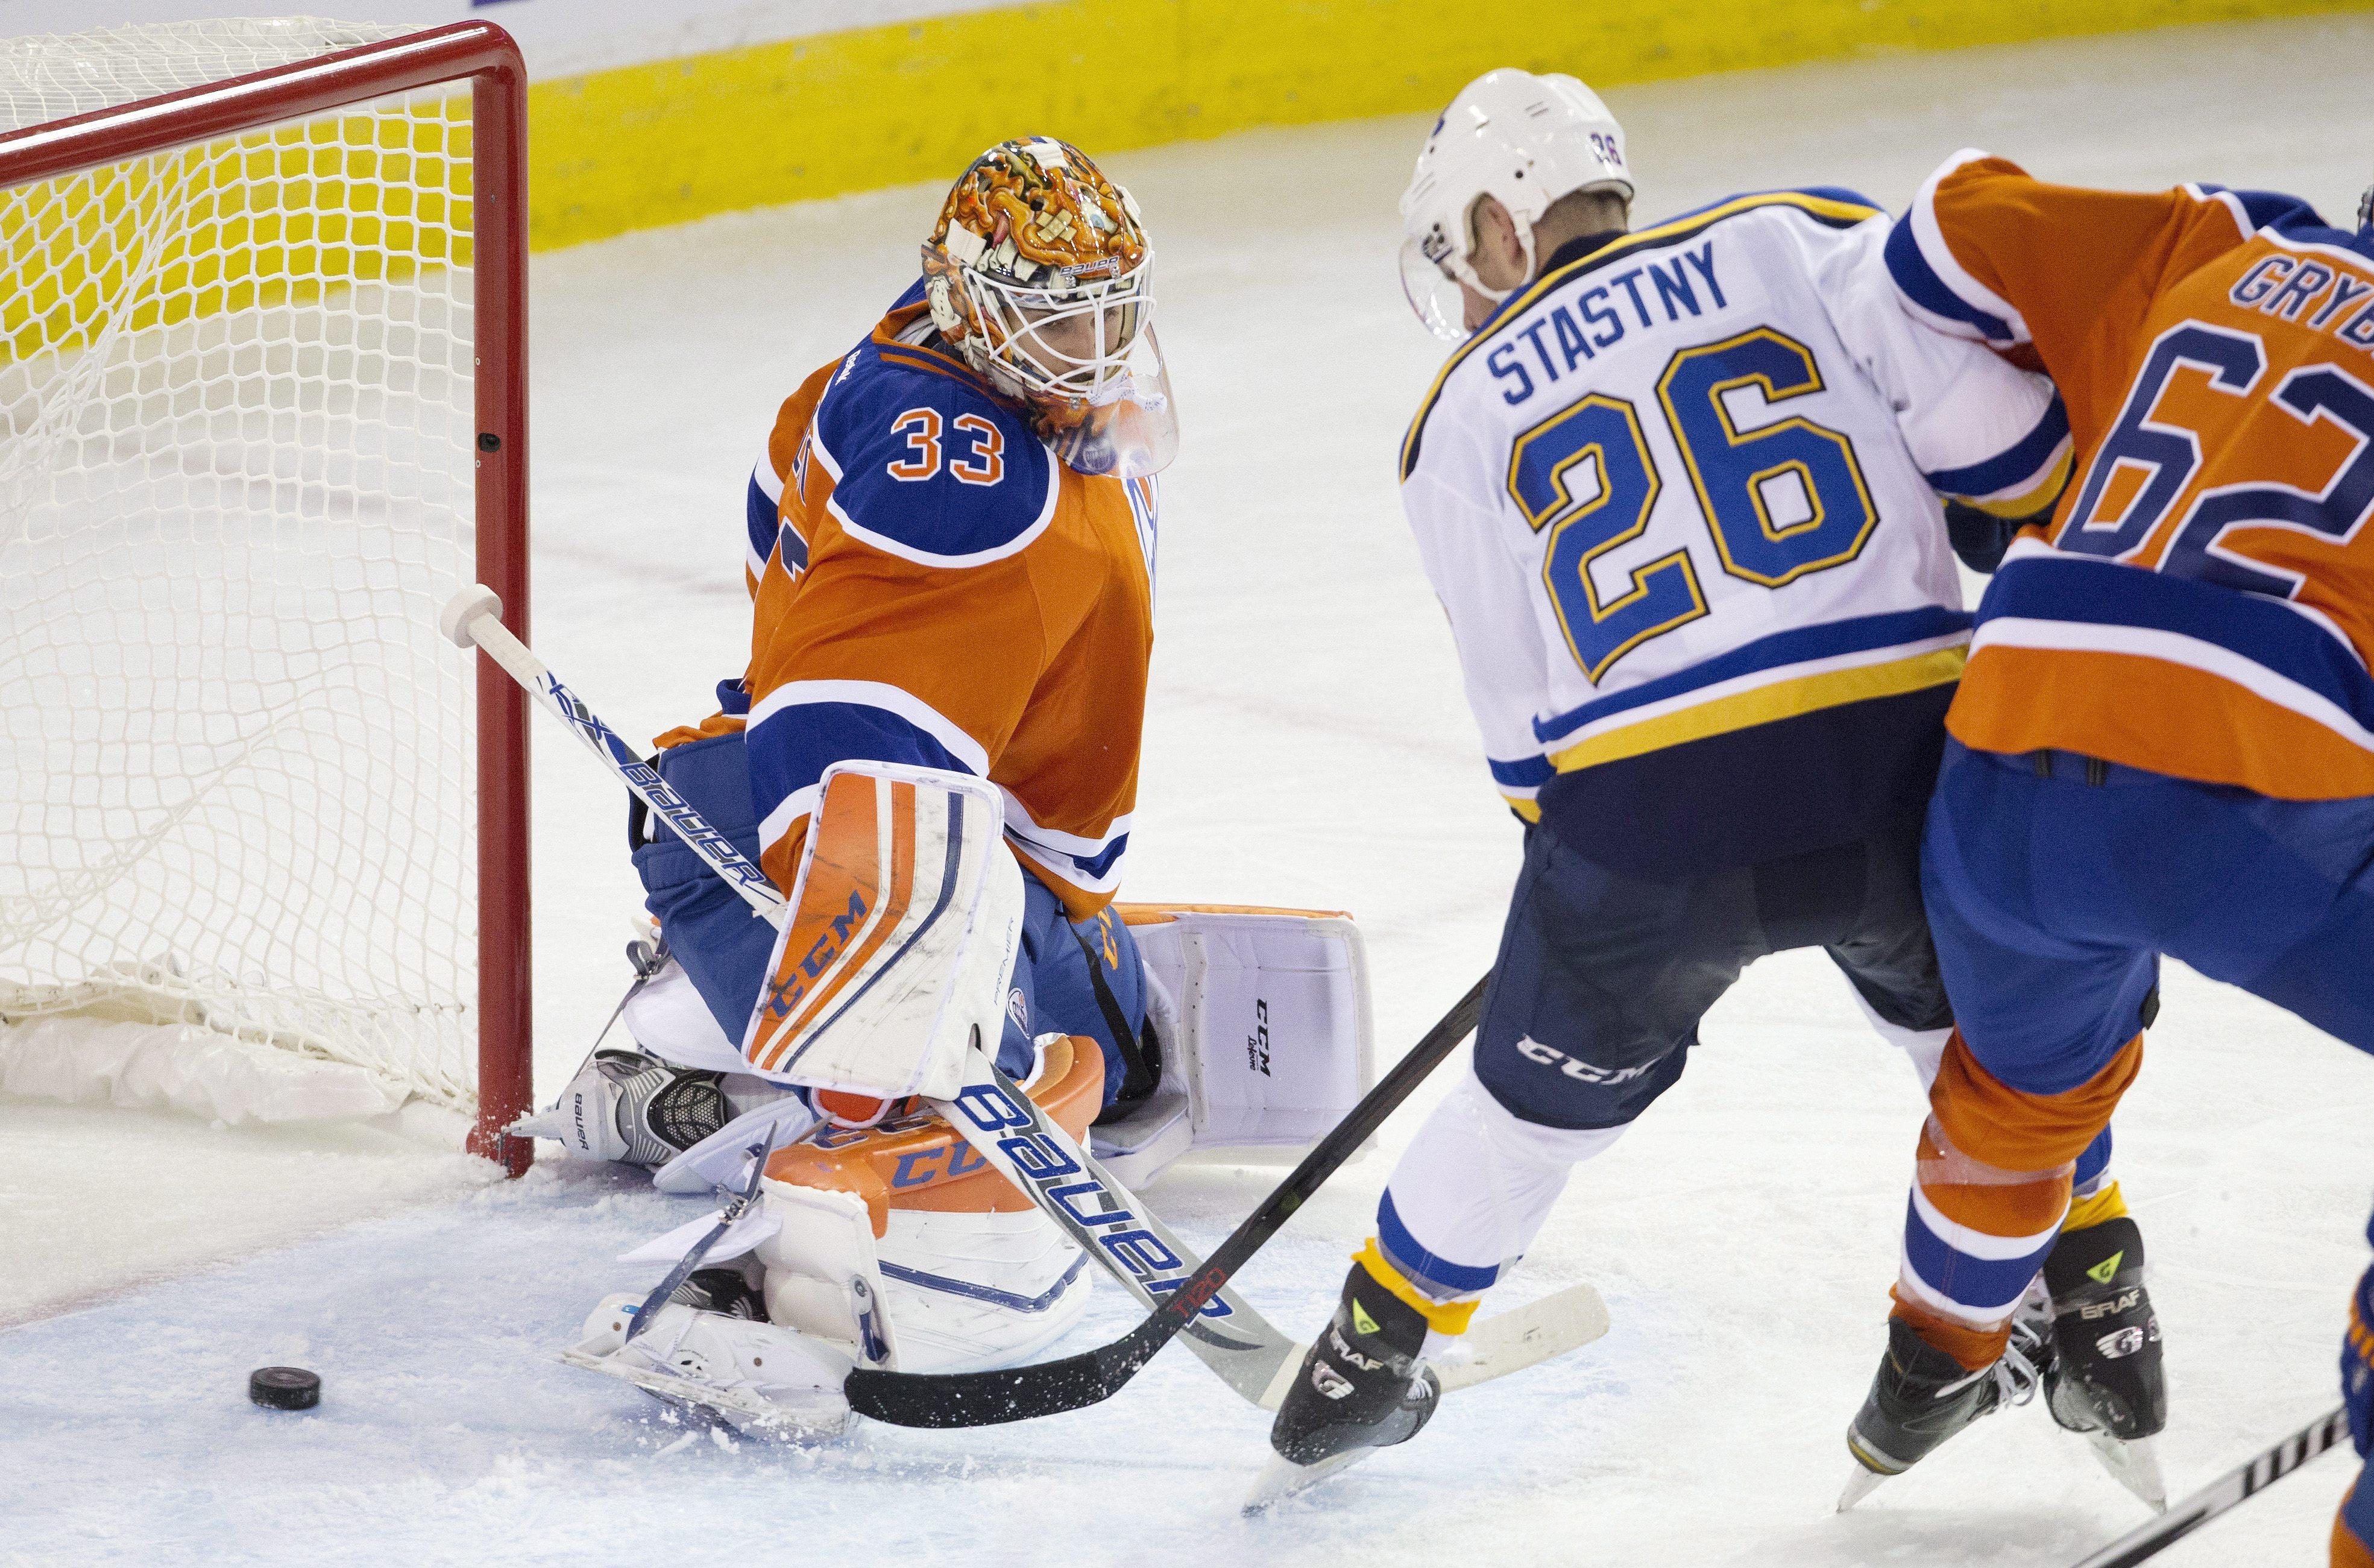 St. Louis Blues' Paul Stastny (26) scores a goal on Edmonton Oilers goalie Cam Talbot (33) during the third period of an NHL hockey game Thursday, Oct. 15, 2015, in Edmonton, Alberta. (Jason Franson/The Canadian Press via AP)